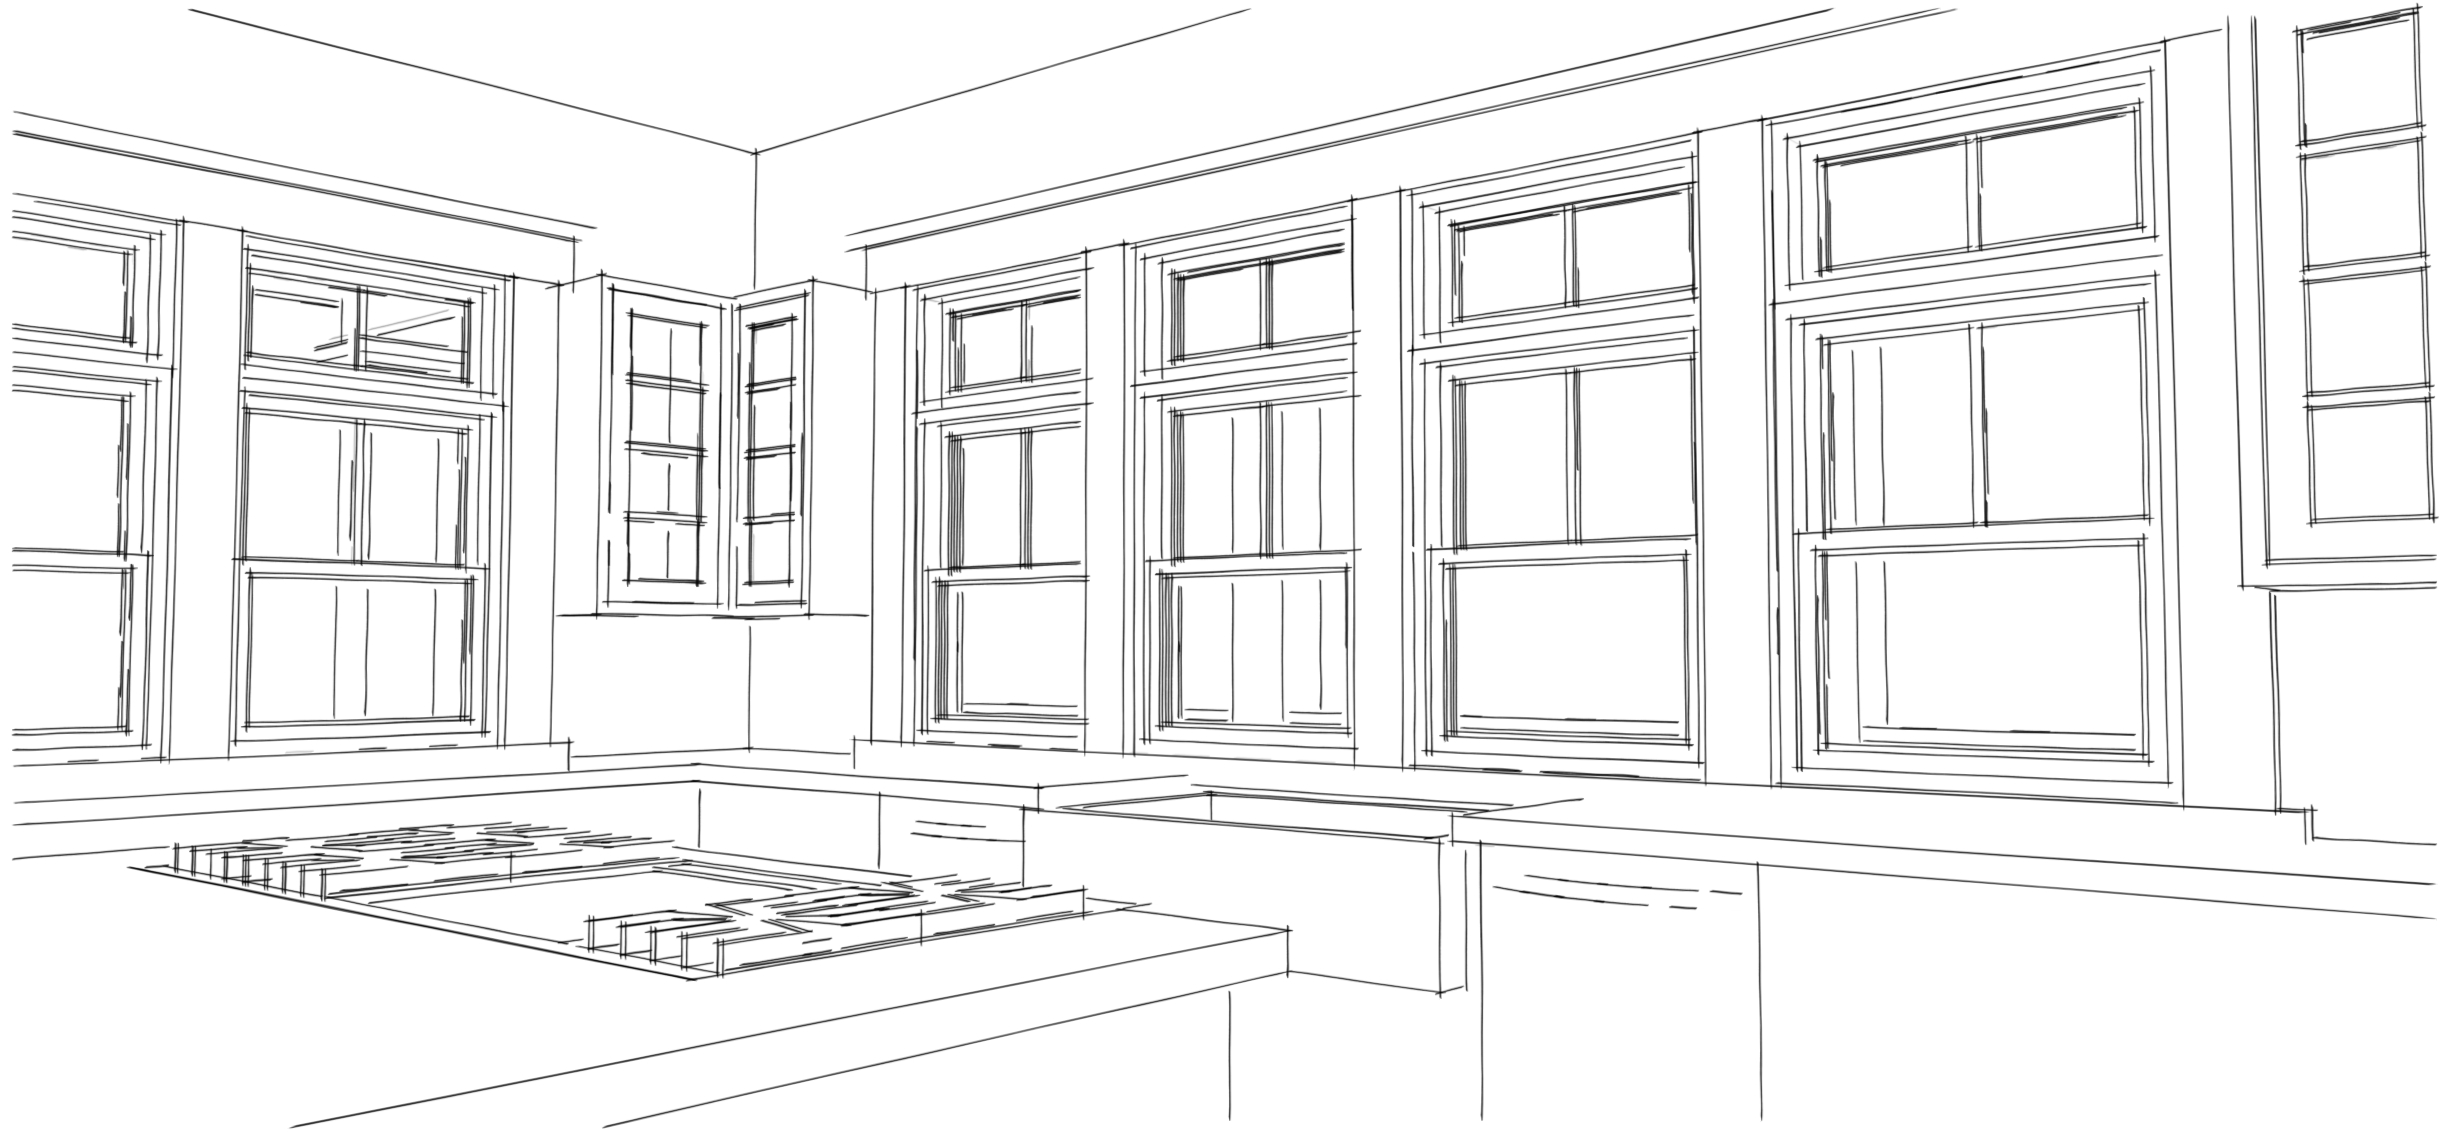 Bluestem House Plans - Kitchen